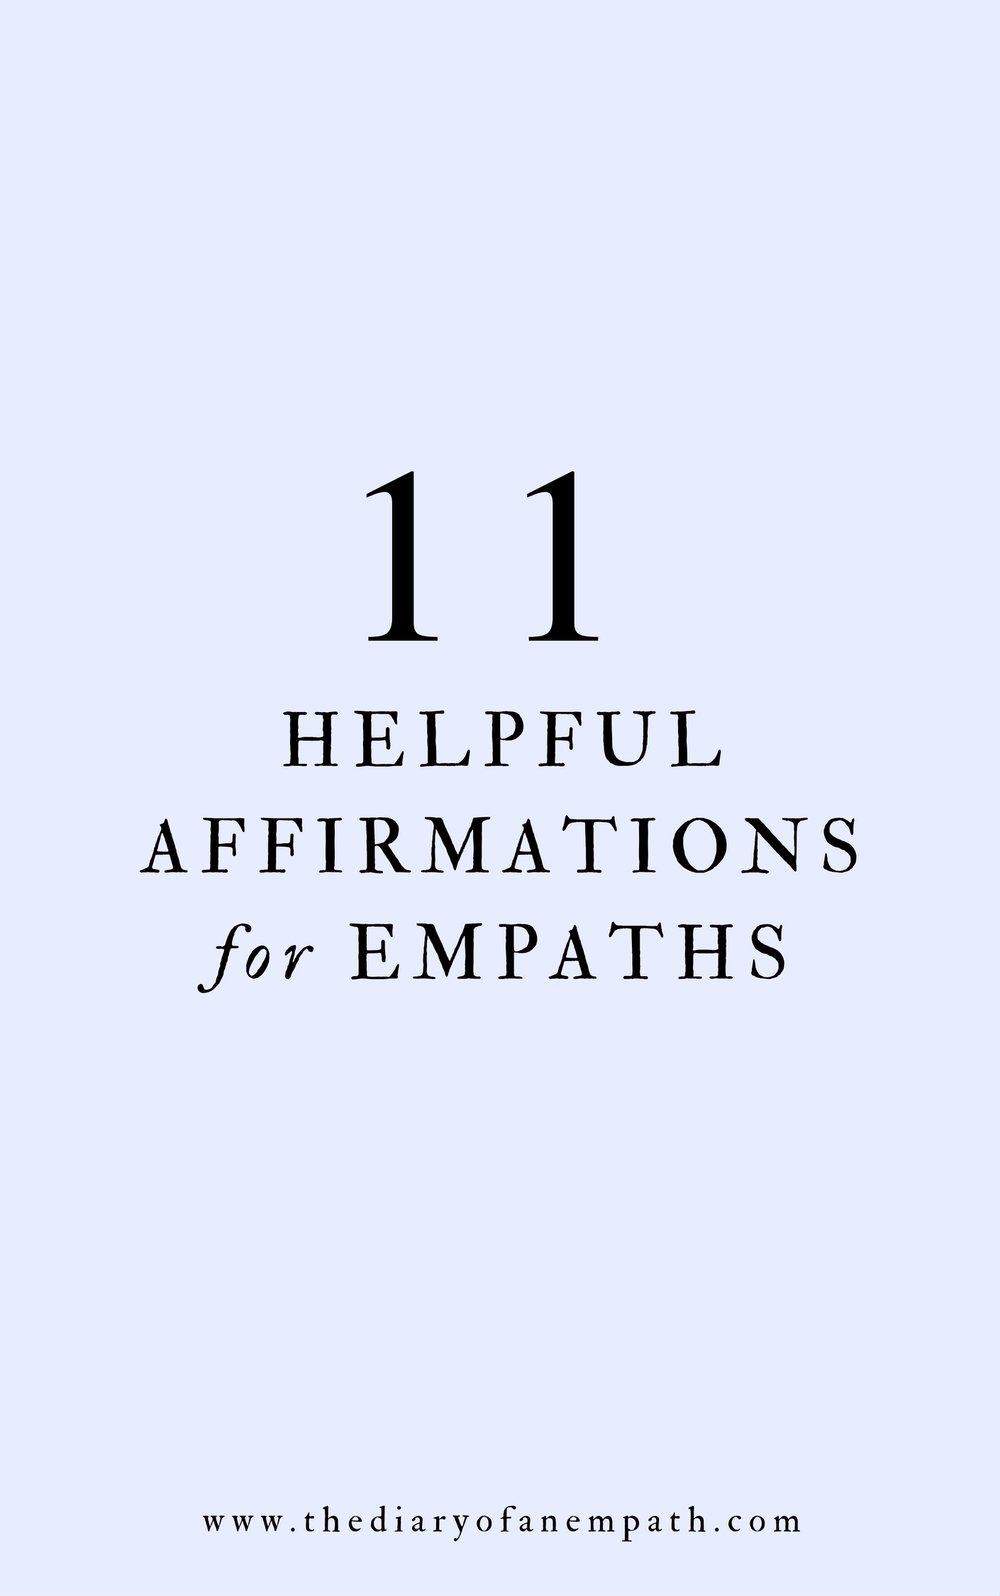 helpful affirmations for empaths, thediaryofanempath.com